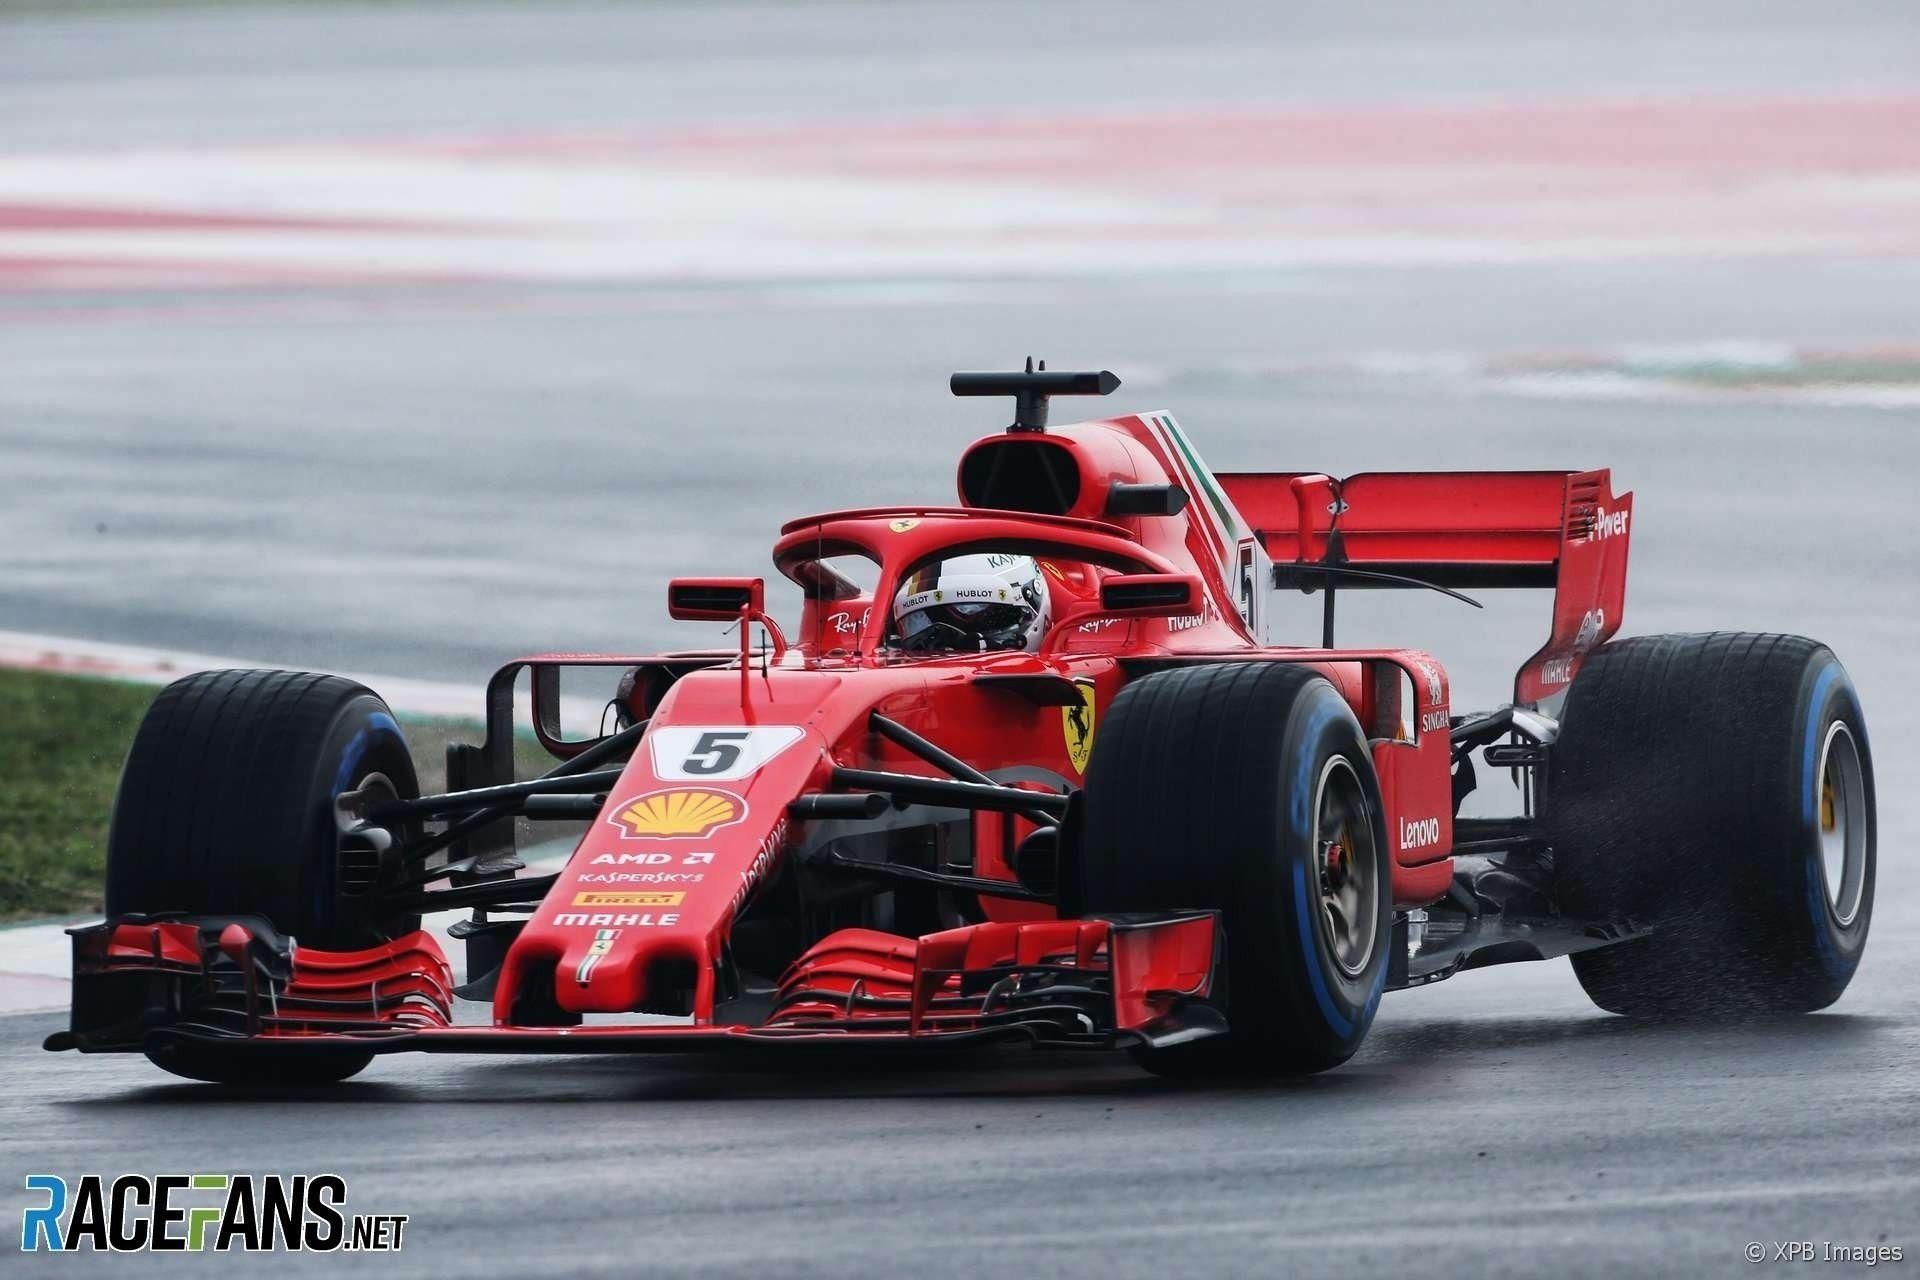 Vettel 2019 Ferrari Review And Specs